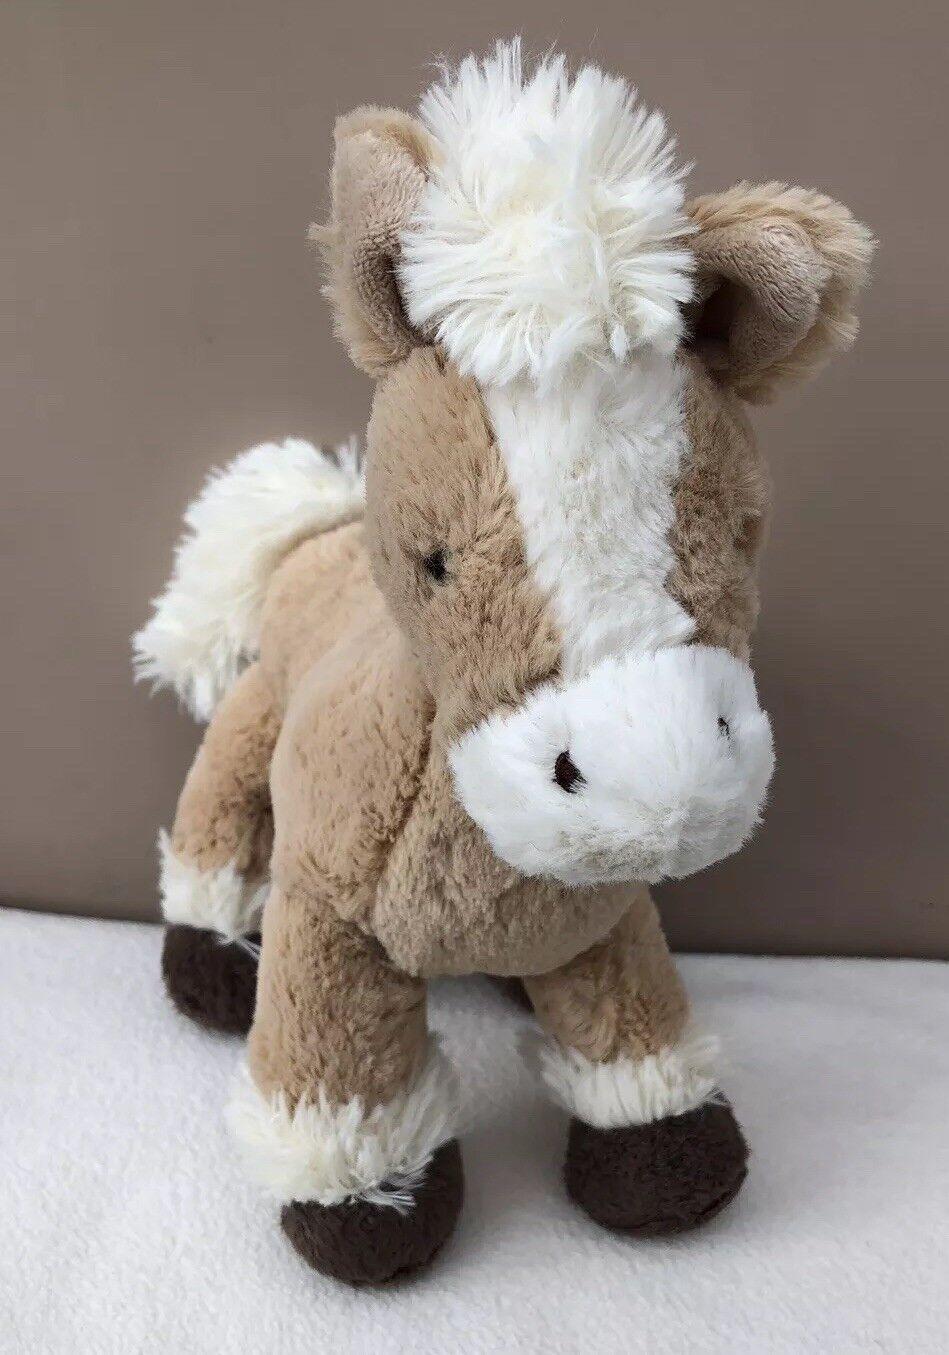 Jellycat Fabulous Filly Palomino Pony Horse Soft Toy Comforter Beige Cream Plush